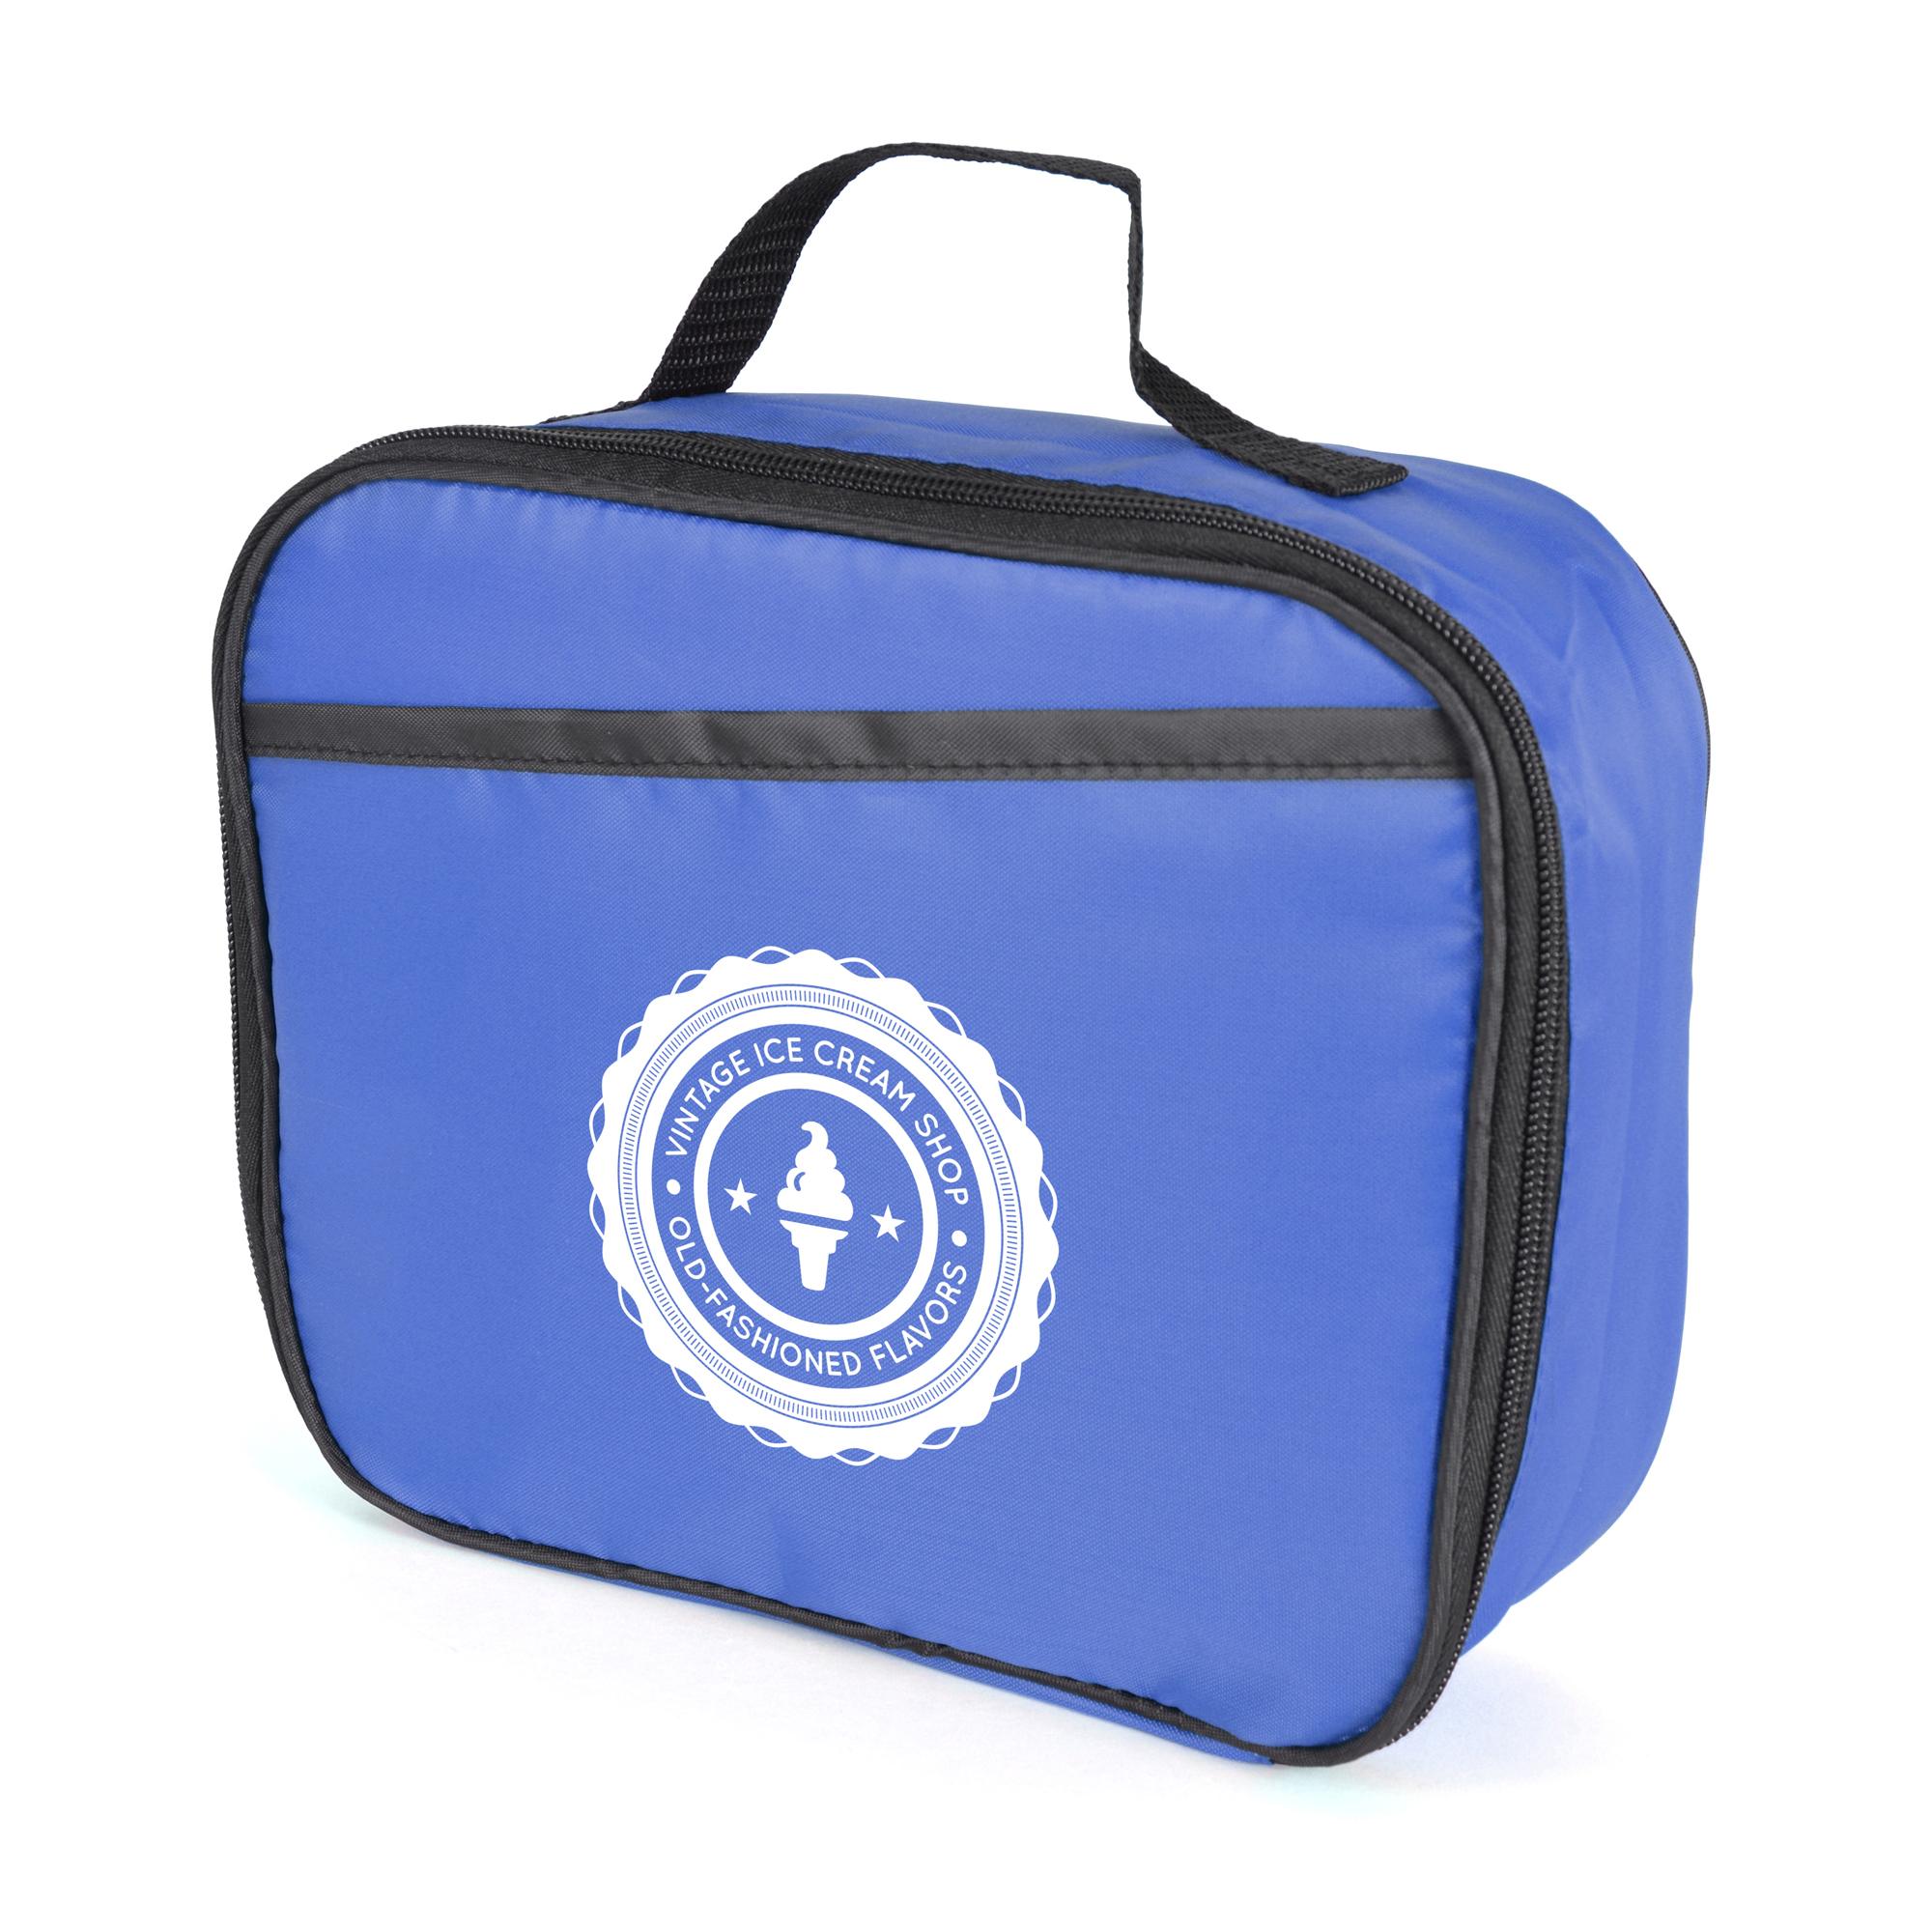 Daniela Cooler Bag in blue